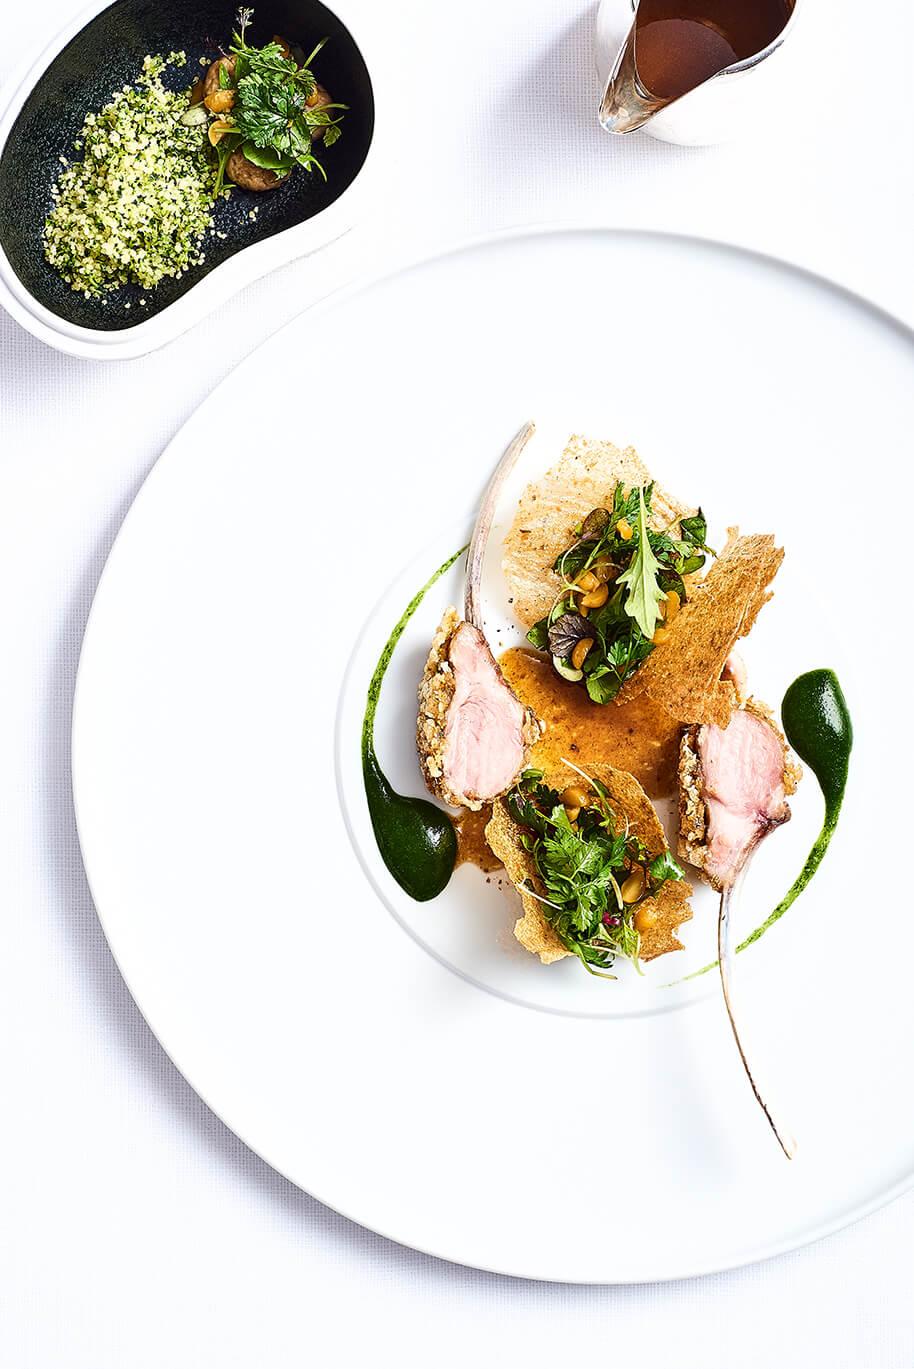 Top Restaurants in Paris You Must-Try During Maison et Objet! top restaurants in paris Top Restaurants in Paris You Must-Try During Maison et Objet! Top Restaurants in Paris You Must Try During Maison et Objet 4